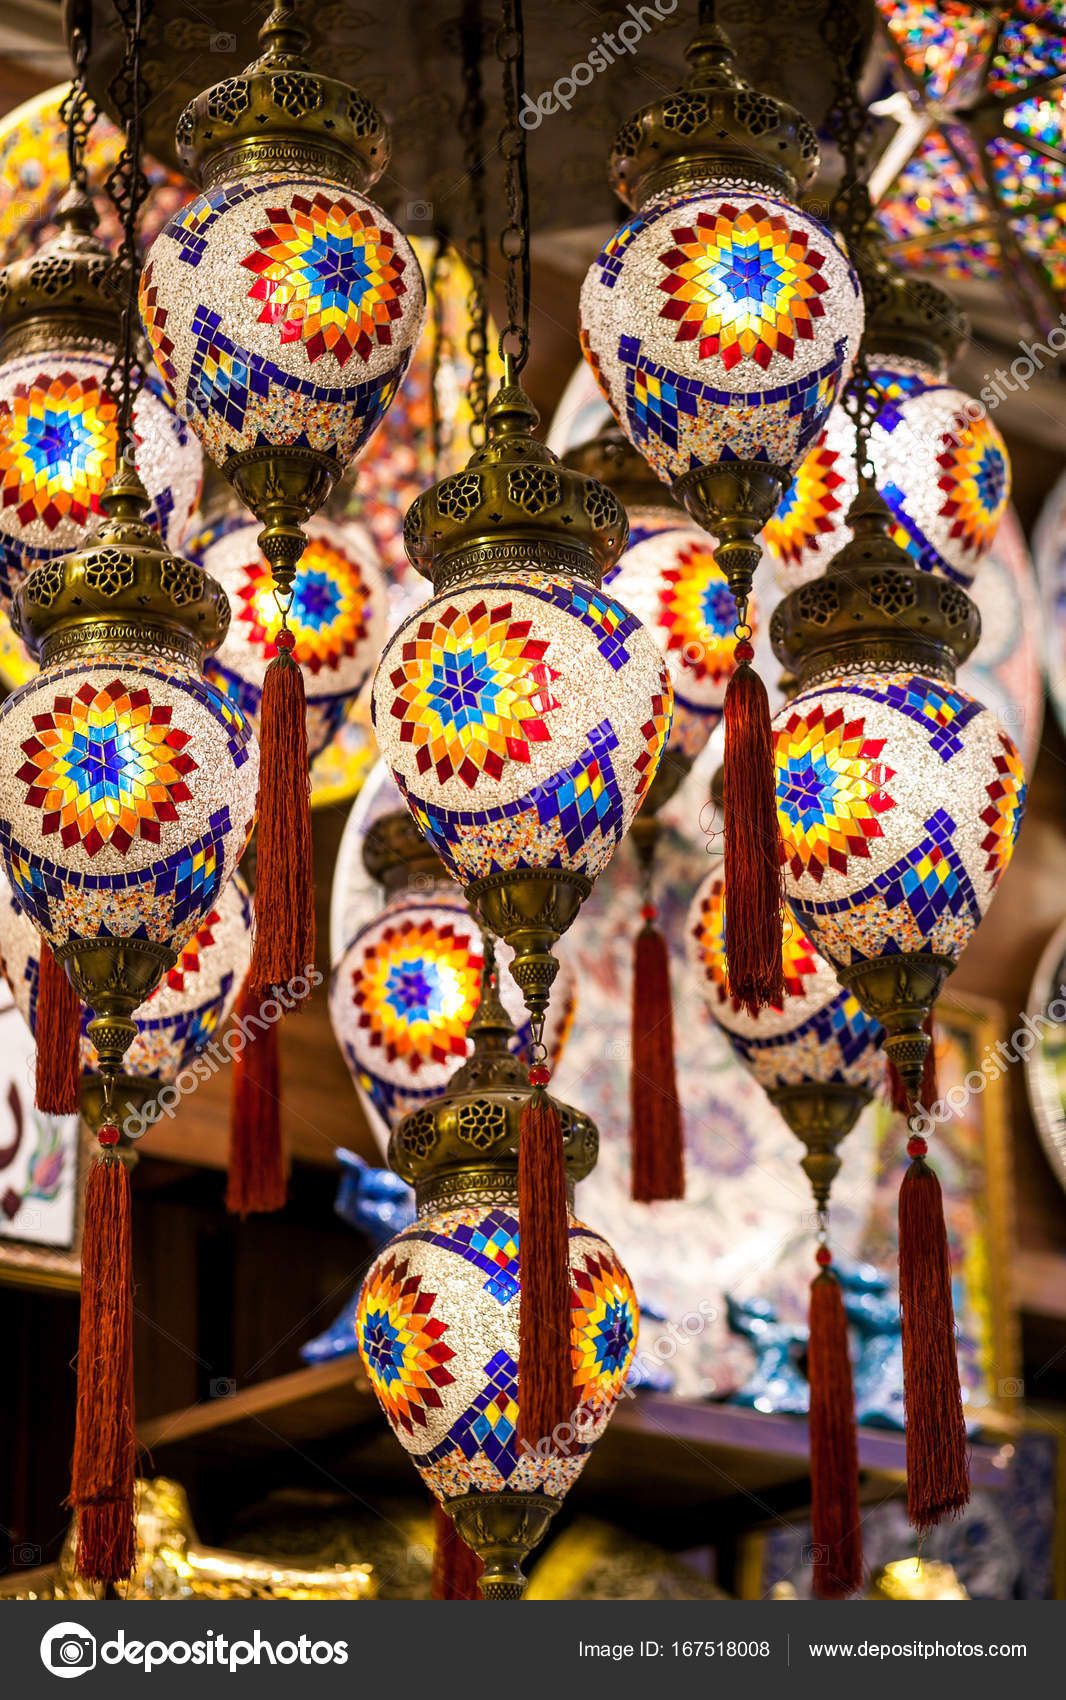 Lanterne Lampade Orientali Foto Stock C A Ostankova 167518008